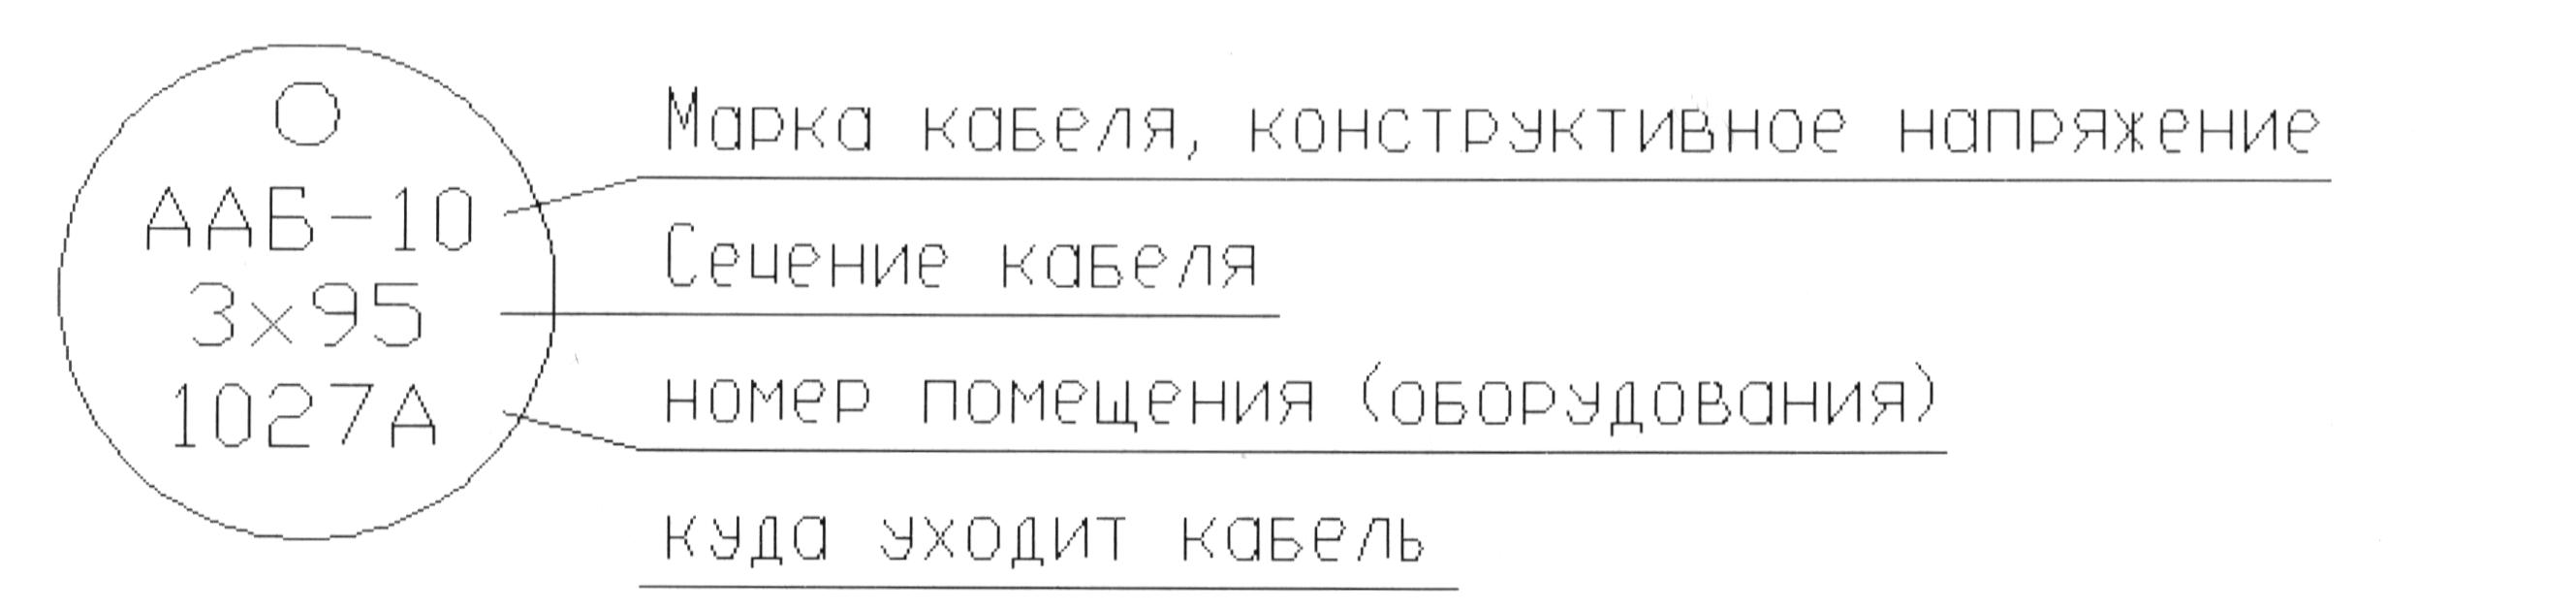 Пример маркировки (бирки) на концевых муфтах в РП, ТП, СП.